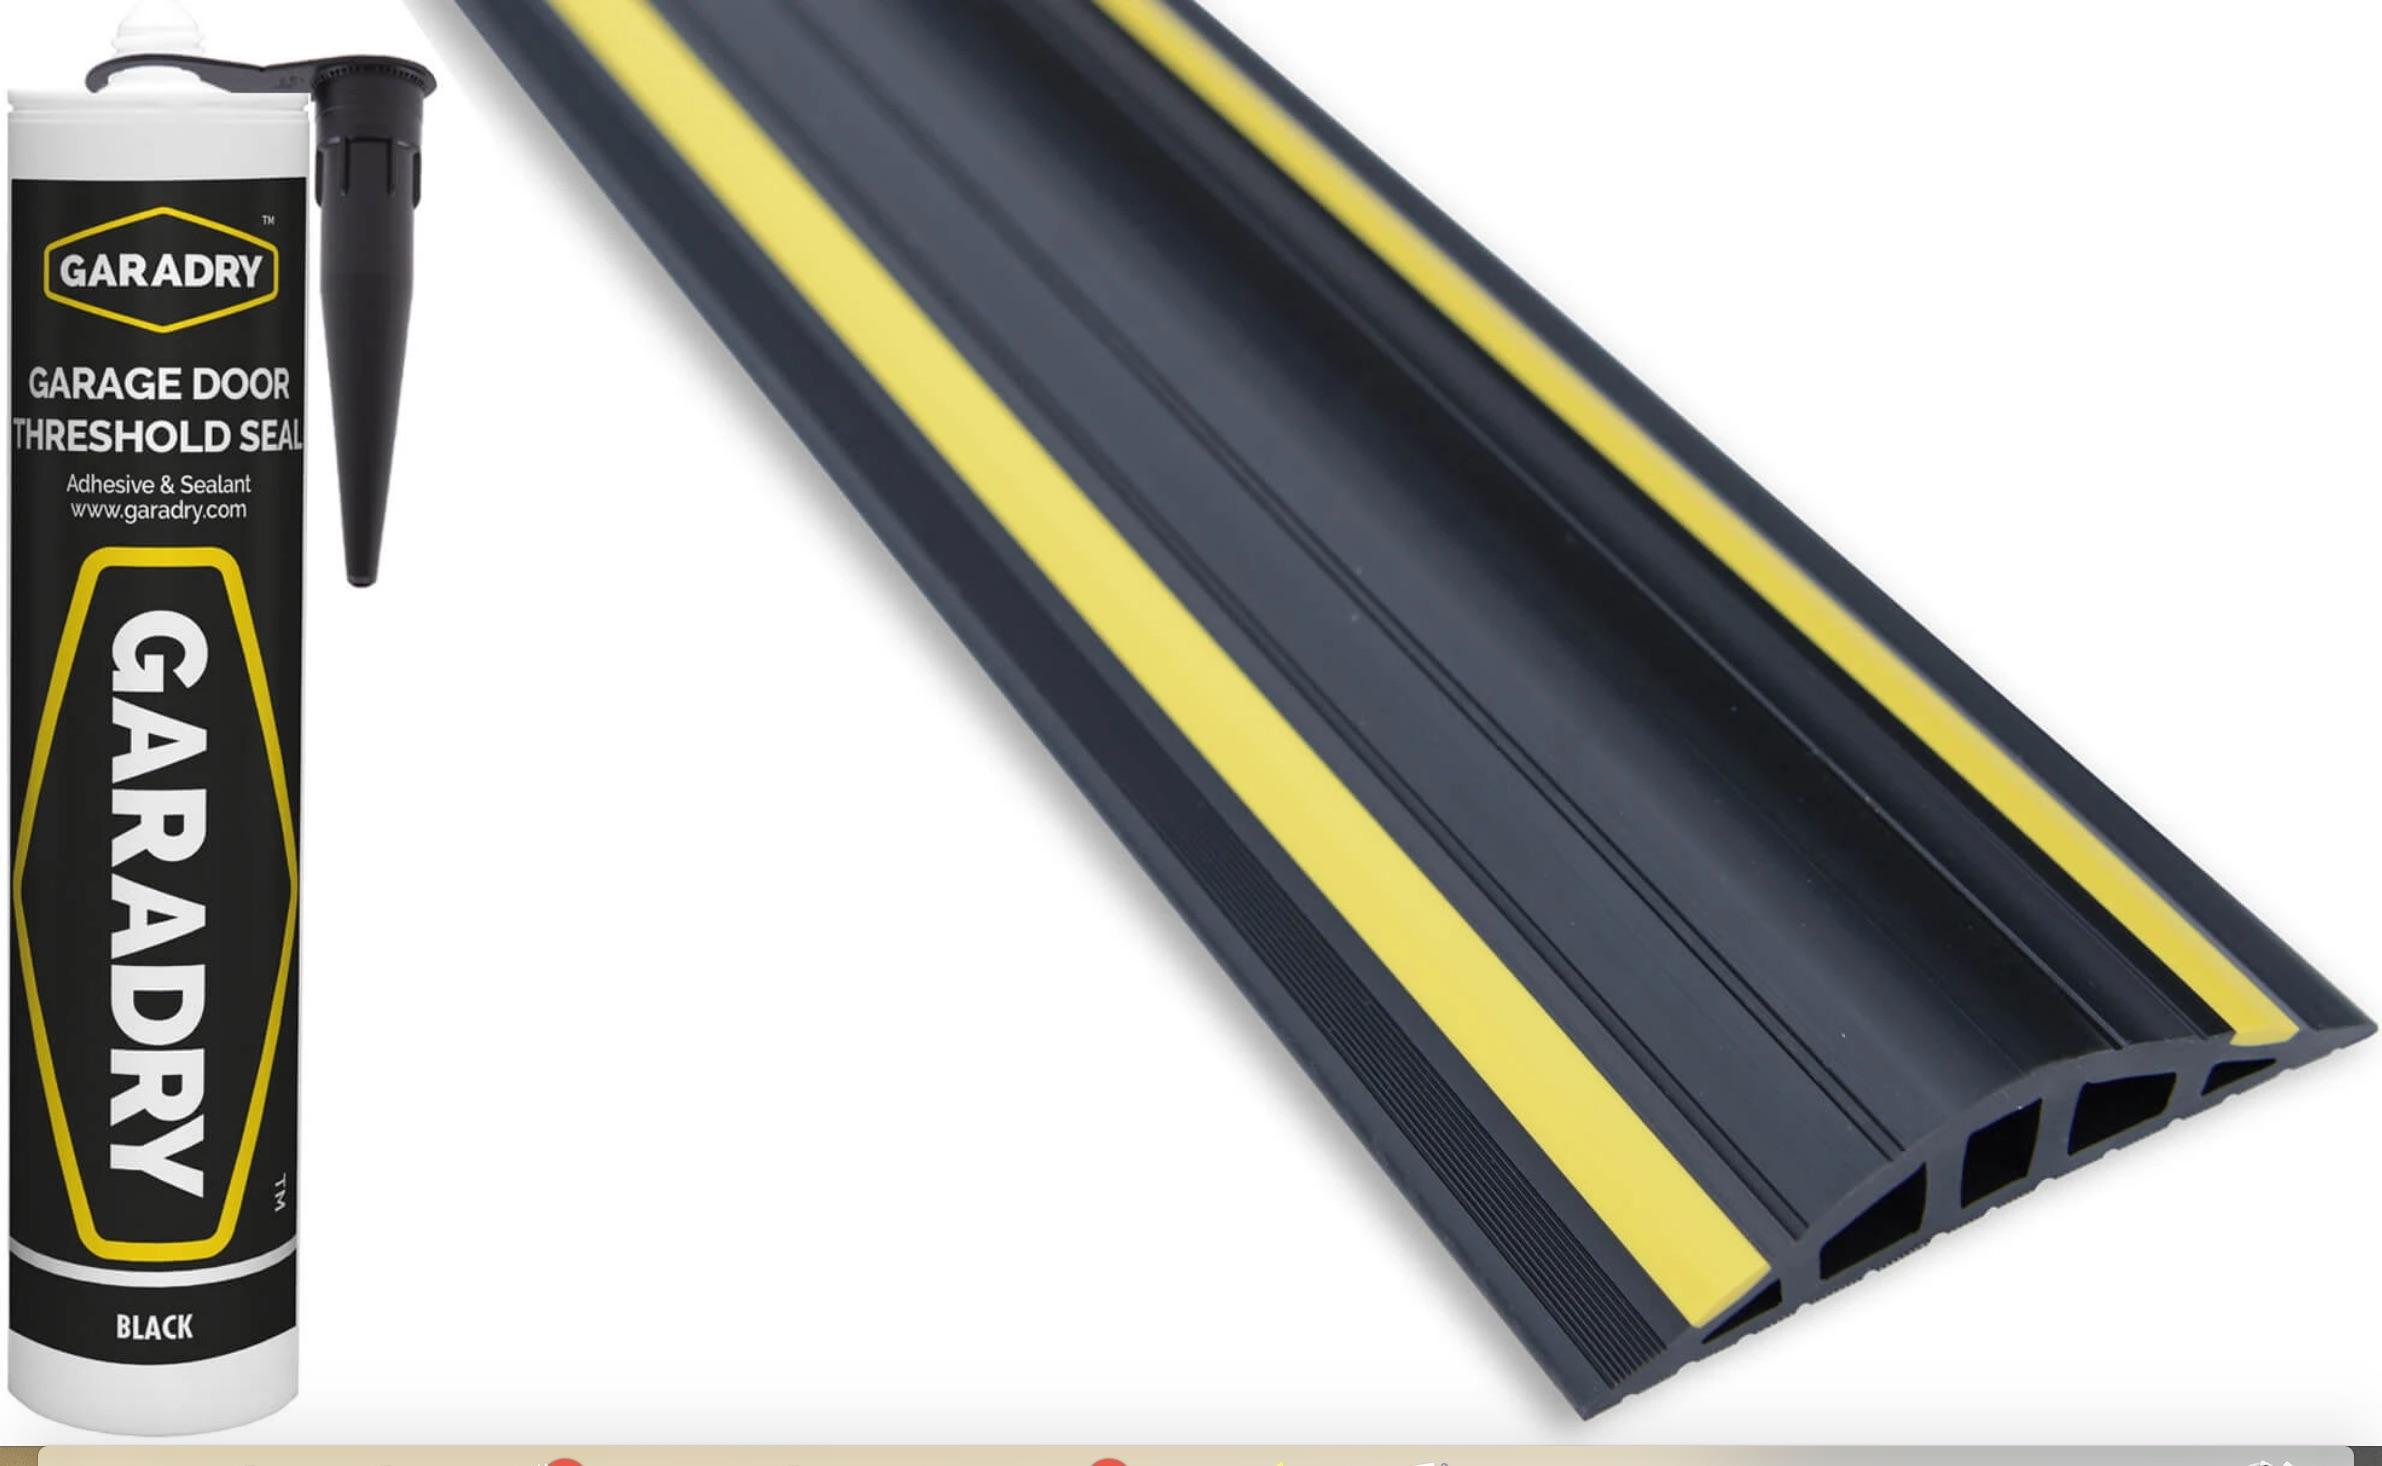 25mm High x 2.21m - 7 foot 3 Long 1 x adhesive